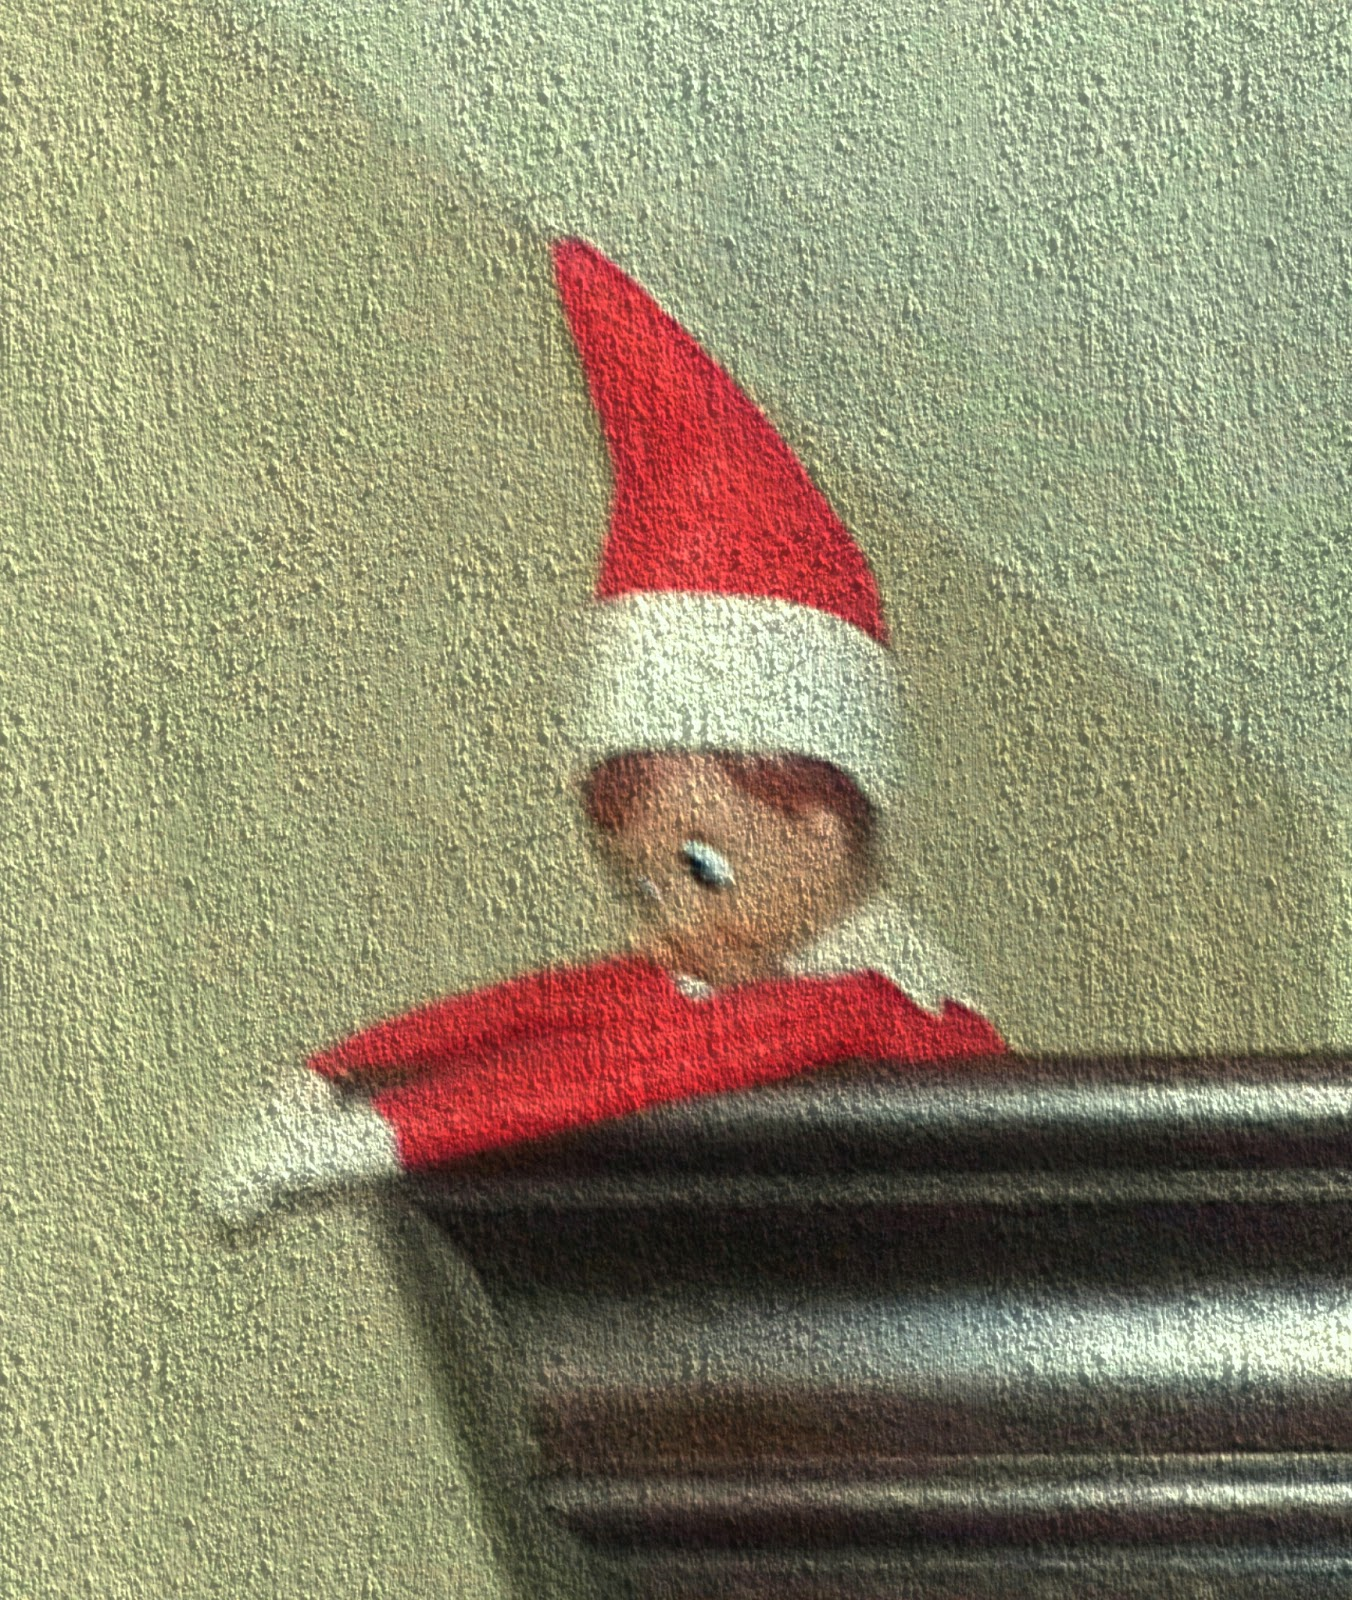 Toodles the Elf Observes Behaviors   Navigating Hectivity by Micki Bare